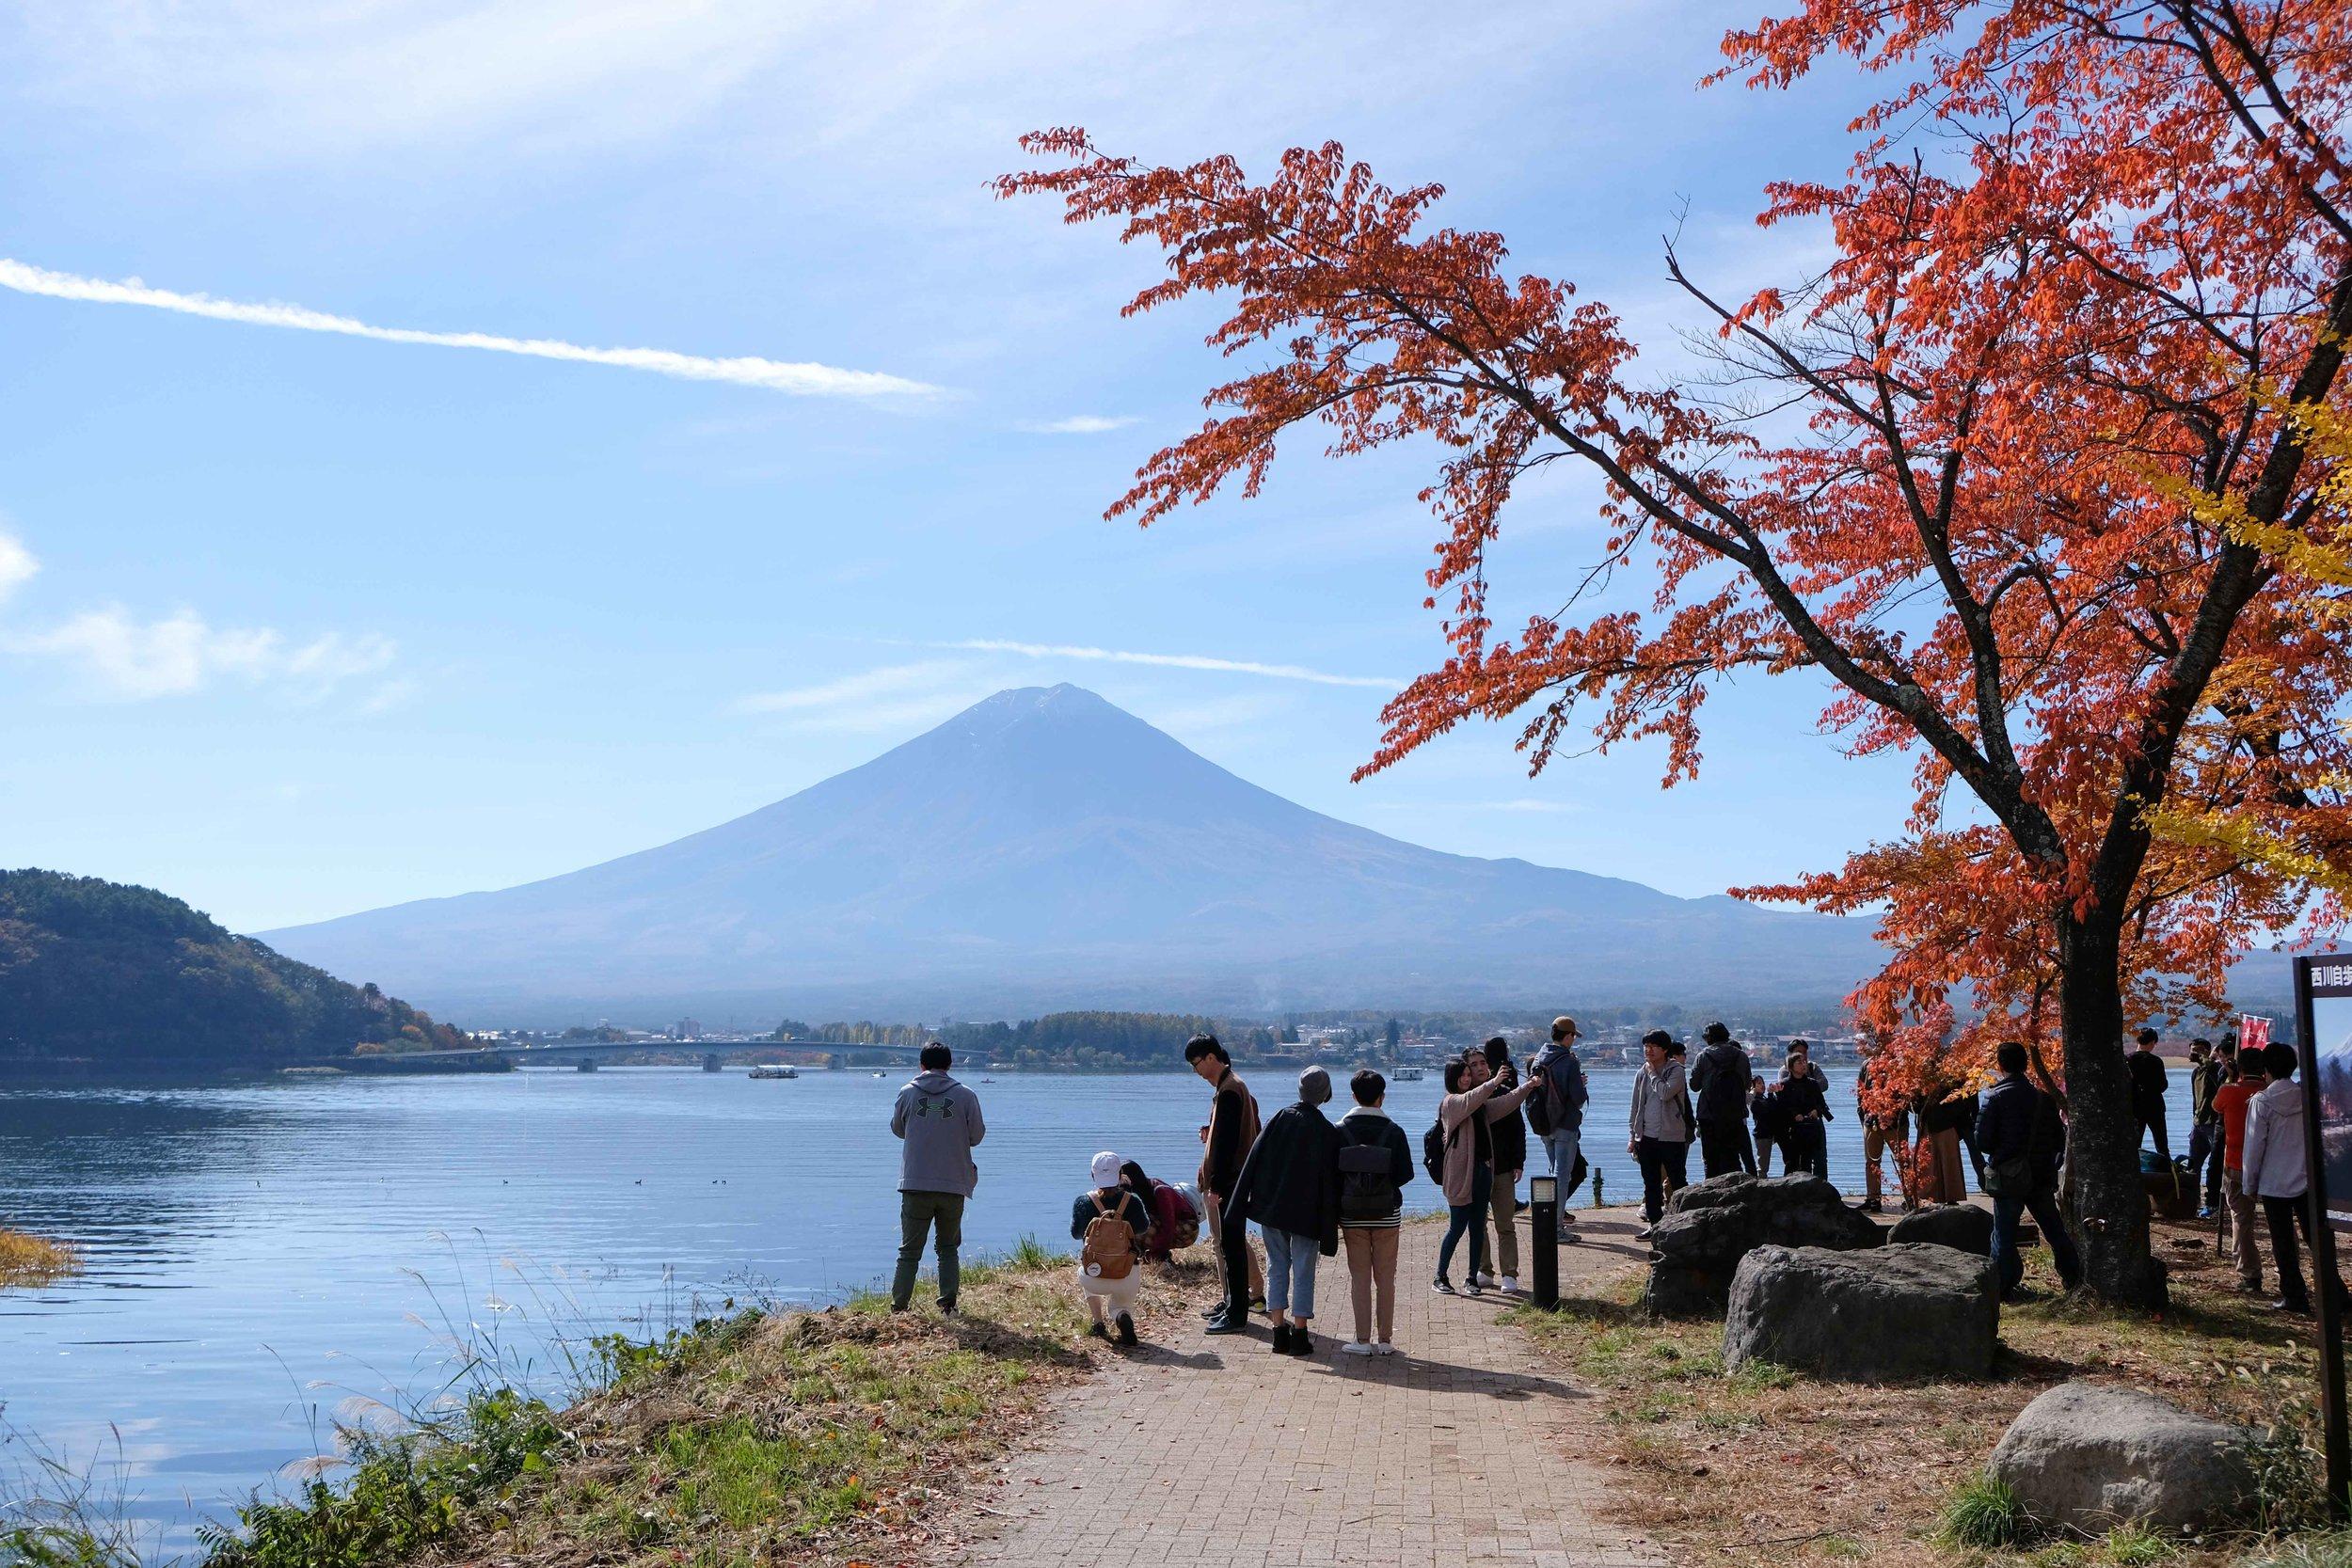 Kawaguchiko Day Trip For Those Mt. Fuji Views - November 15th, 2017